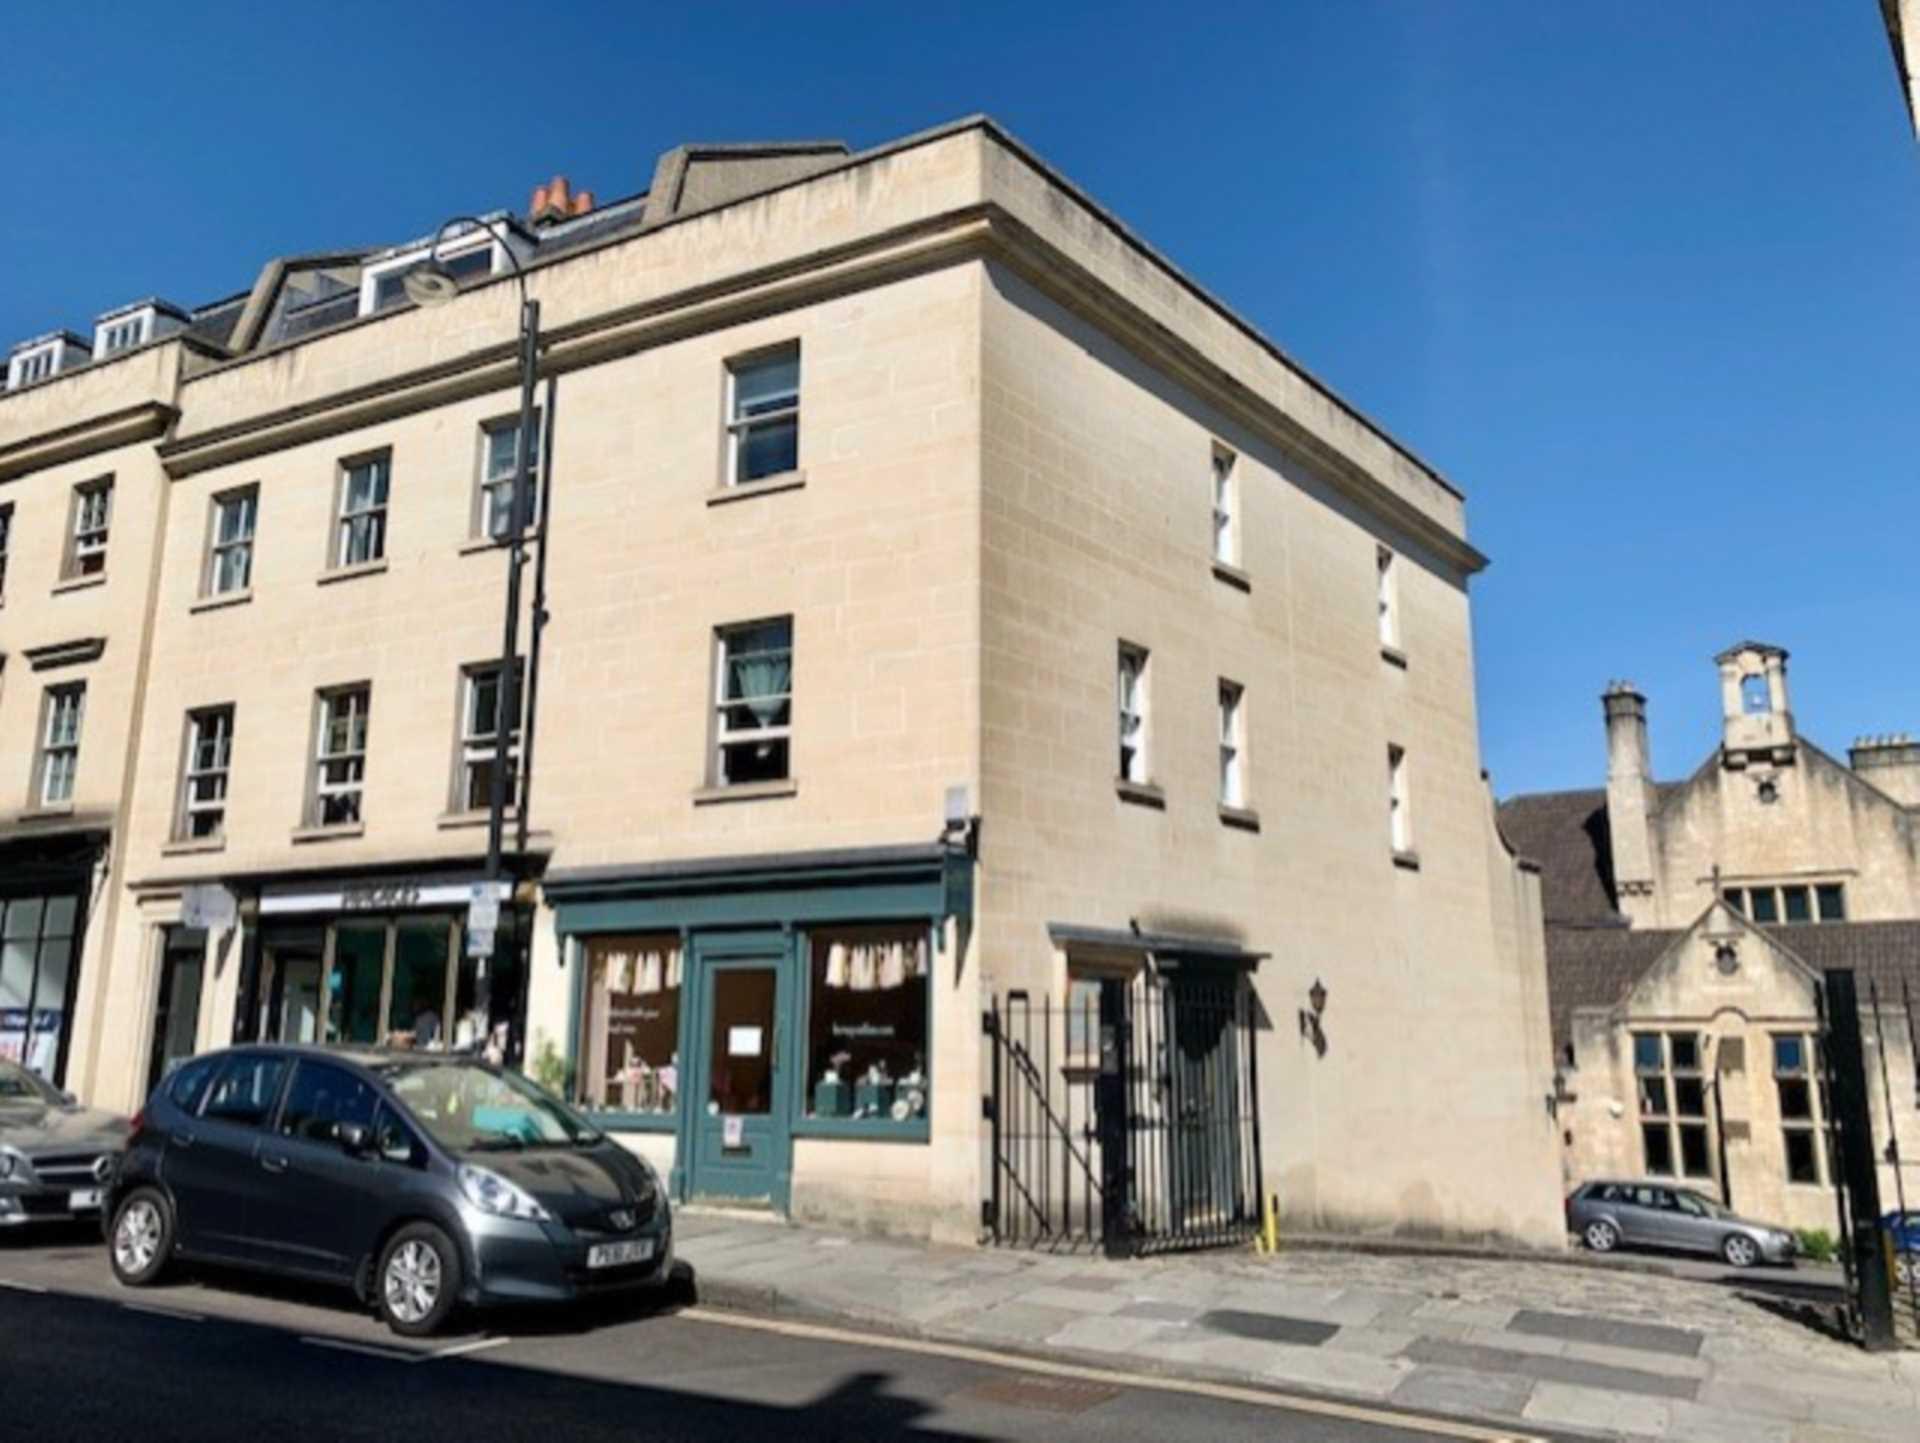 Swallows Property Letting - 2 Bedroom Flat, Walcot Street, Bath